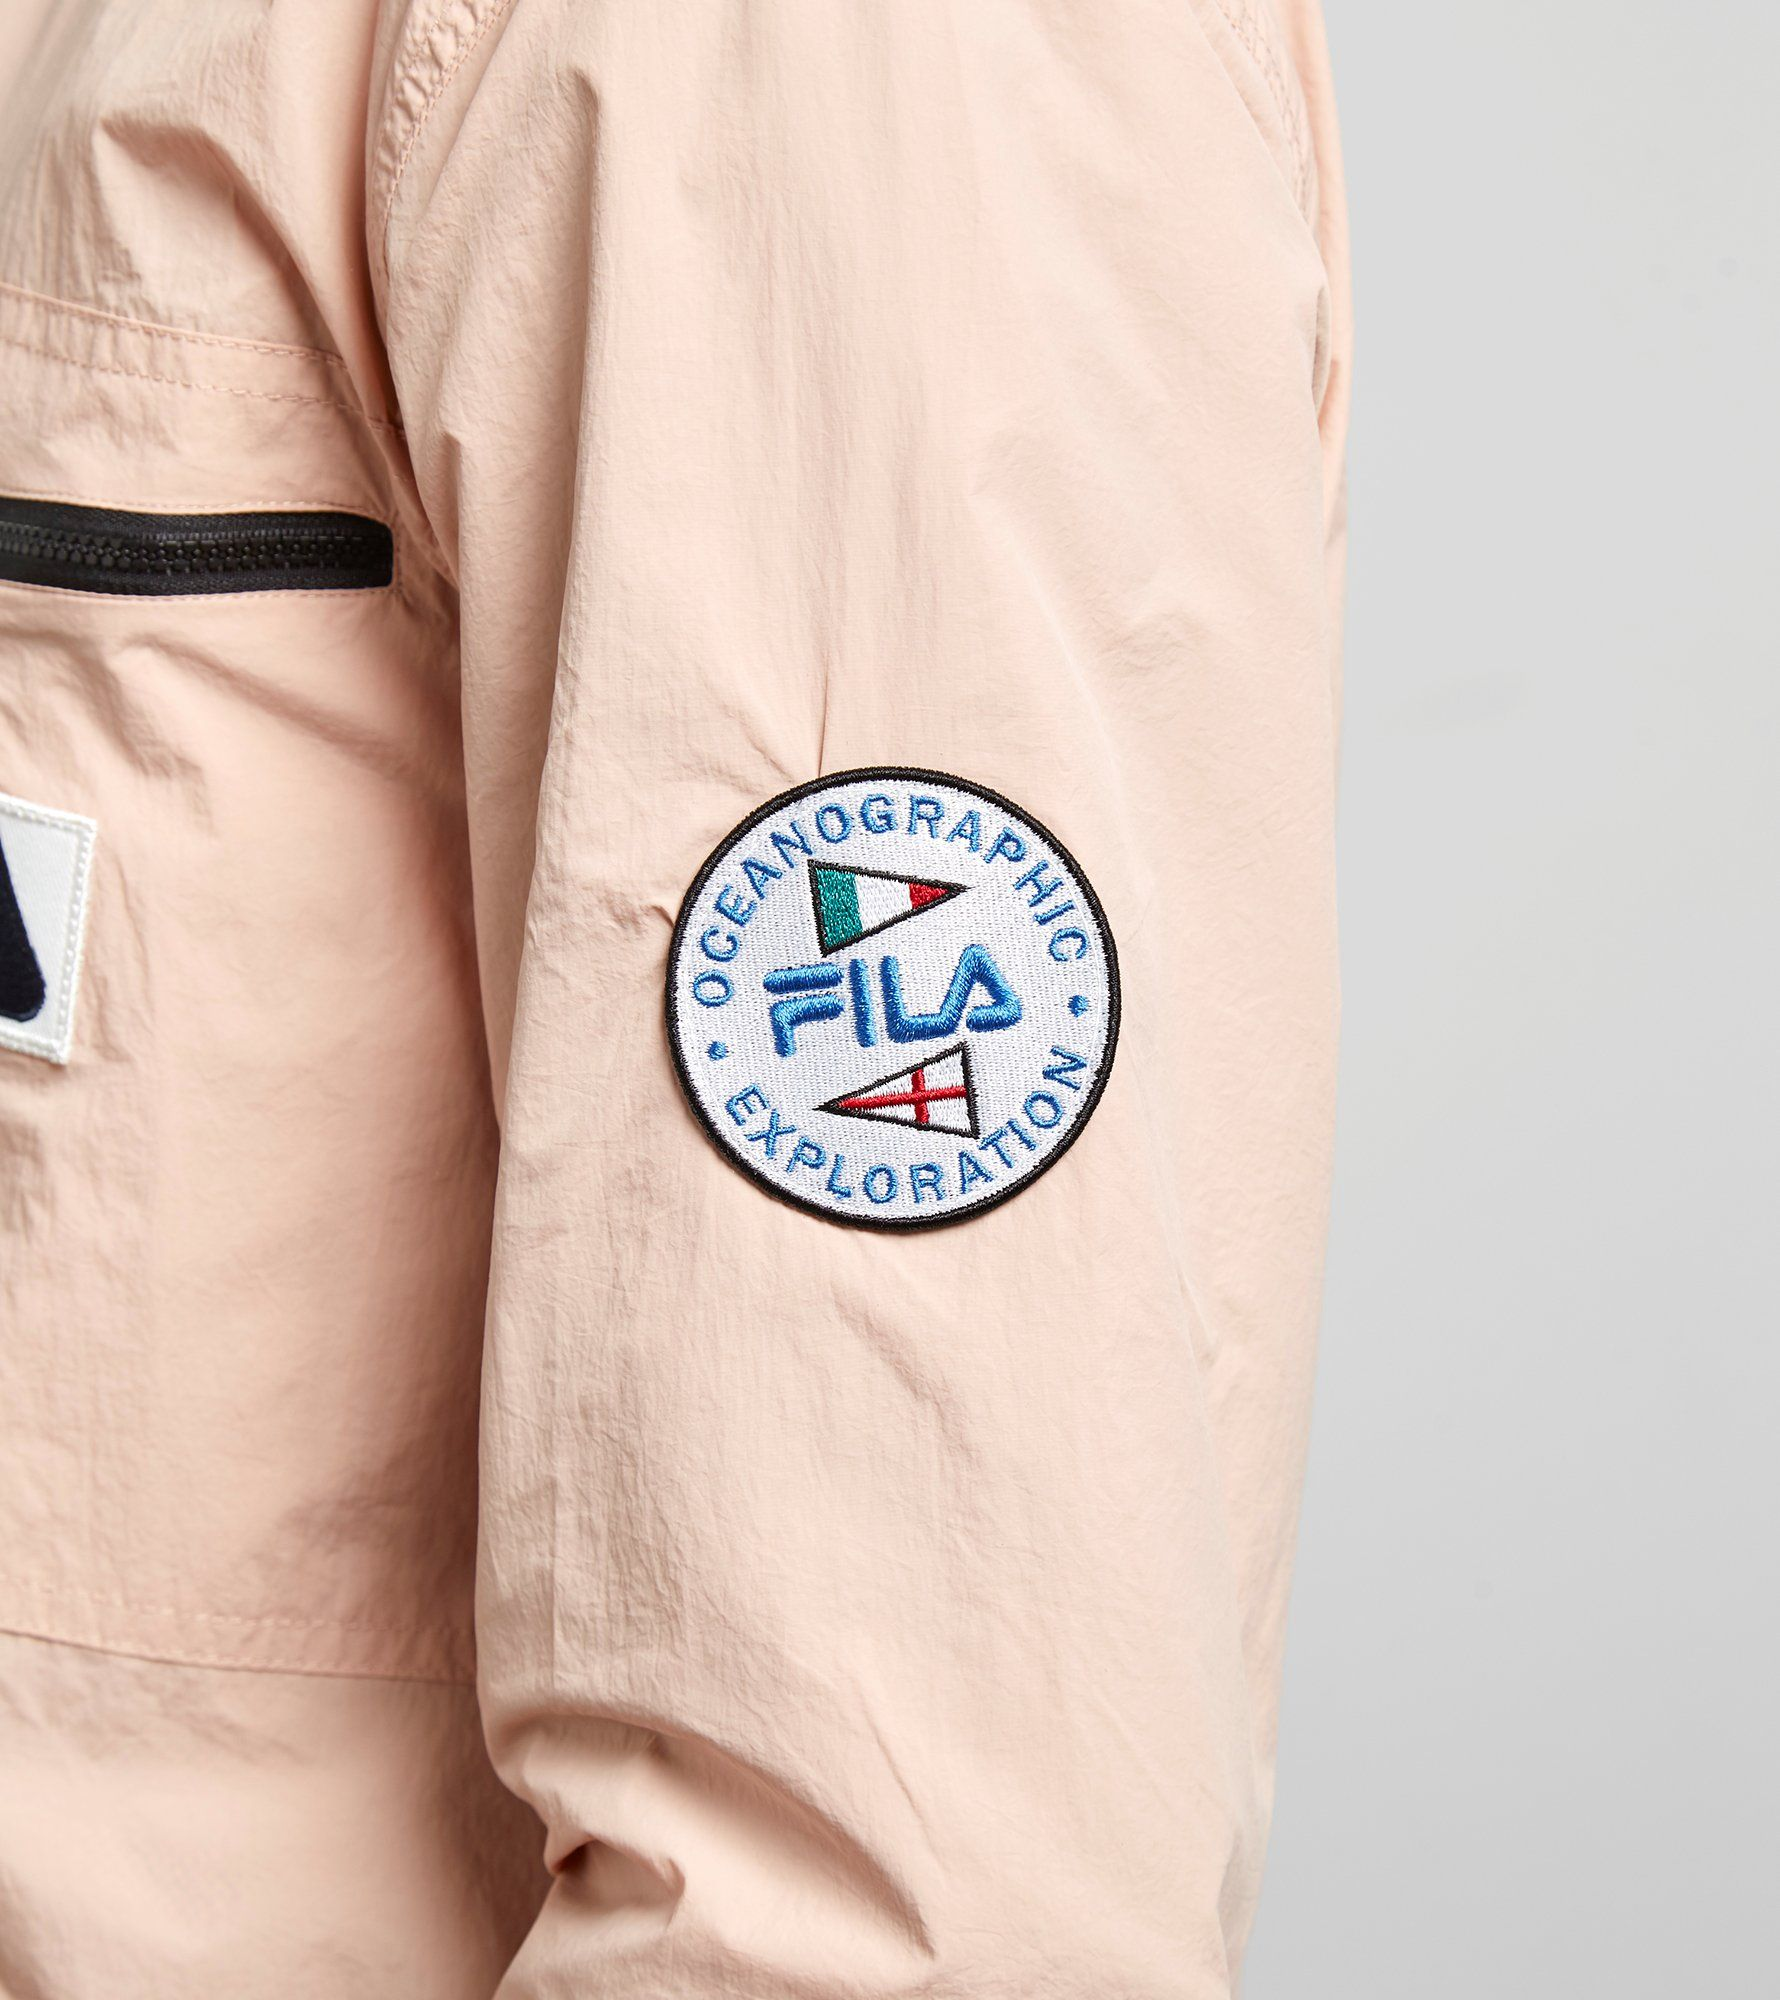 Fila Condor Shirt - size? Exclusive